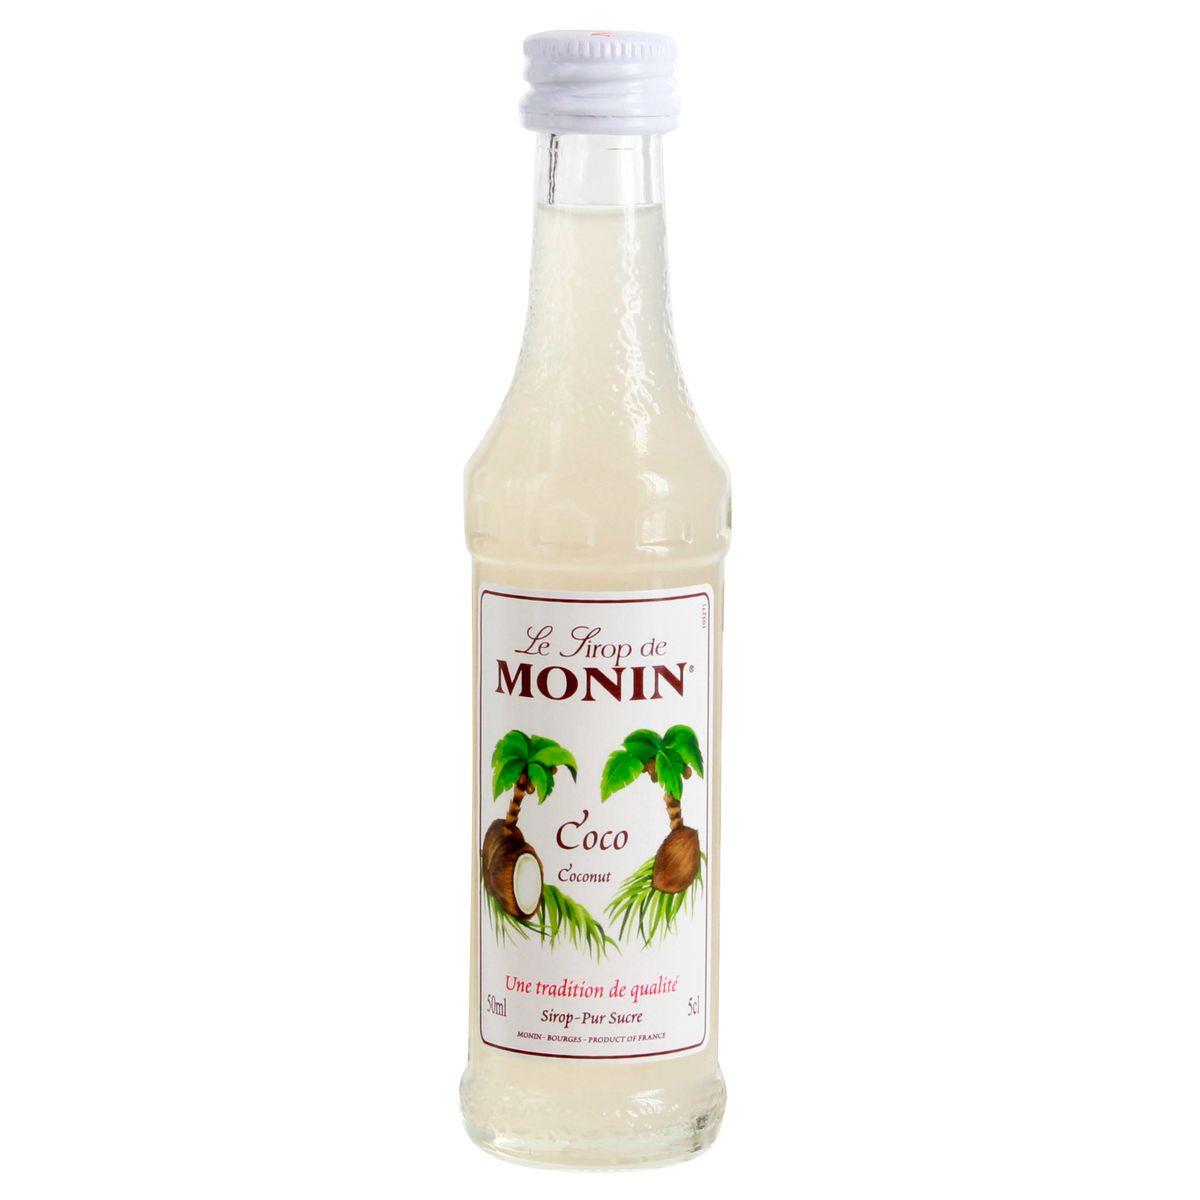 Mignonette sirop - coco 5cl - Monin